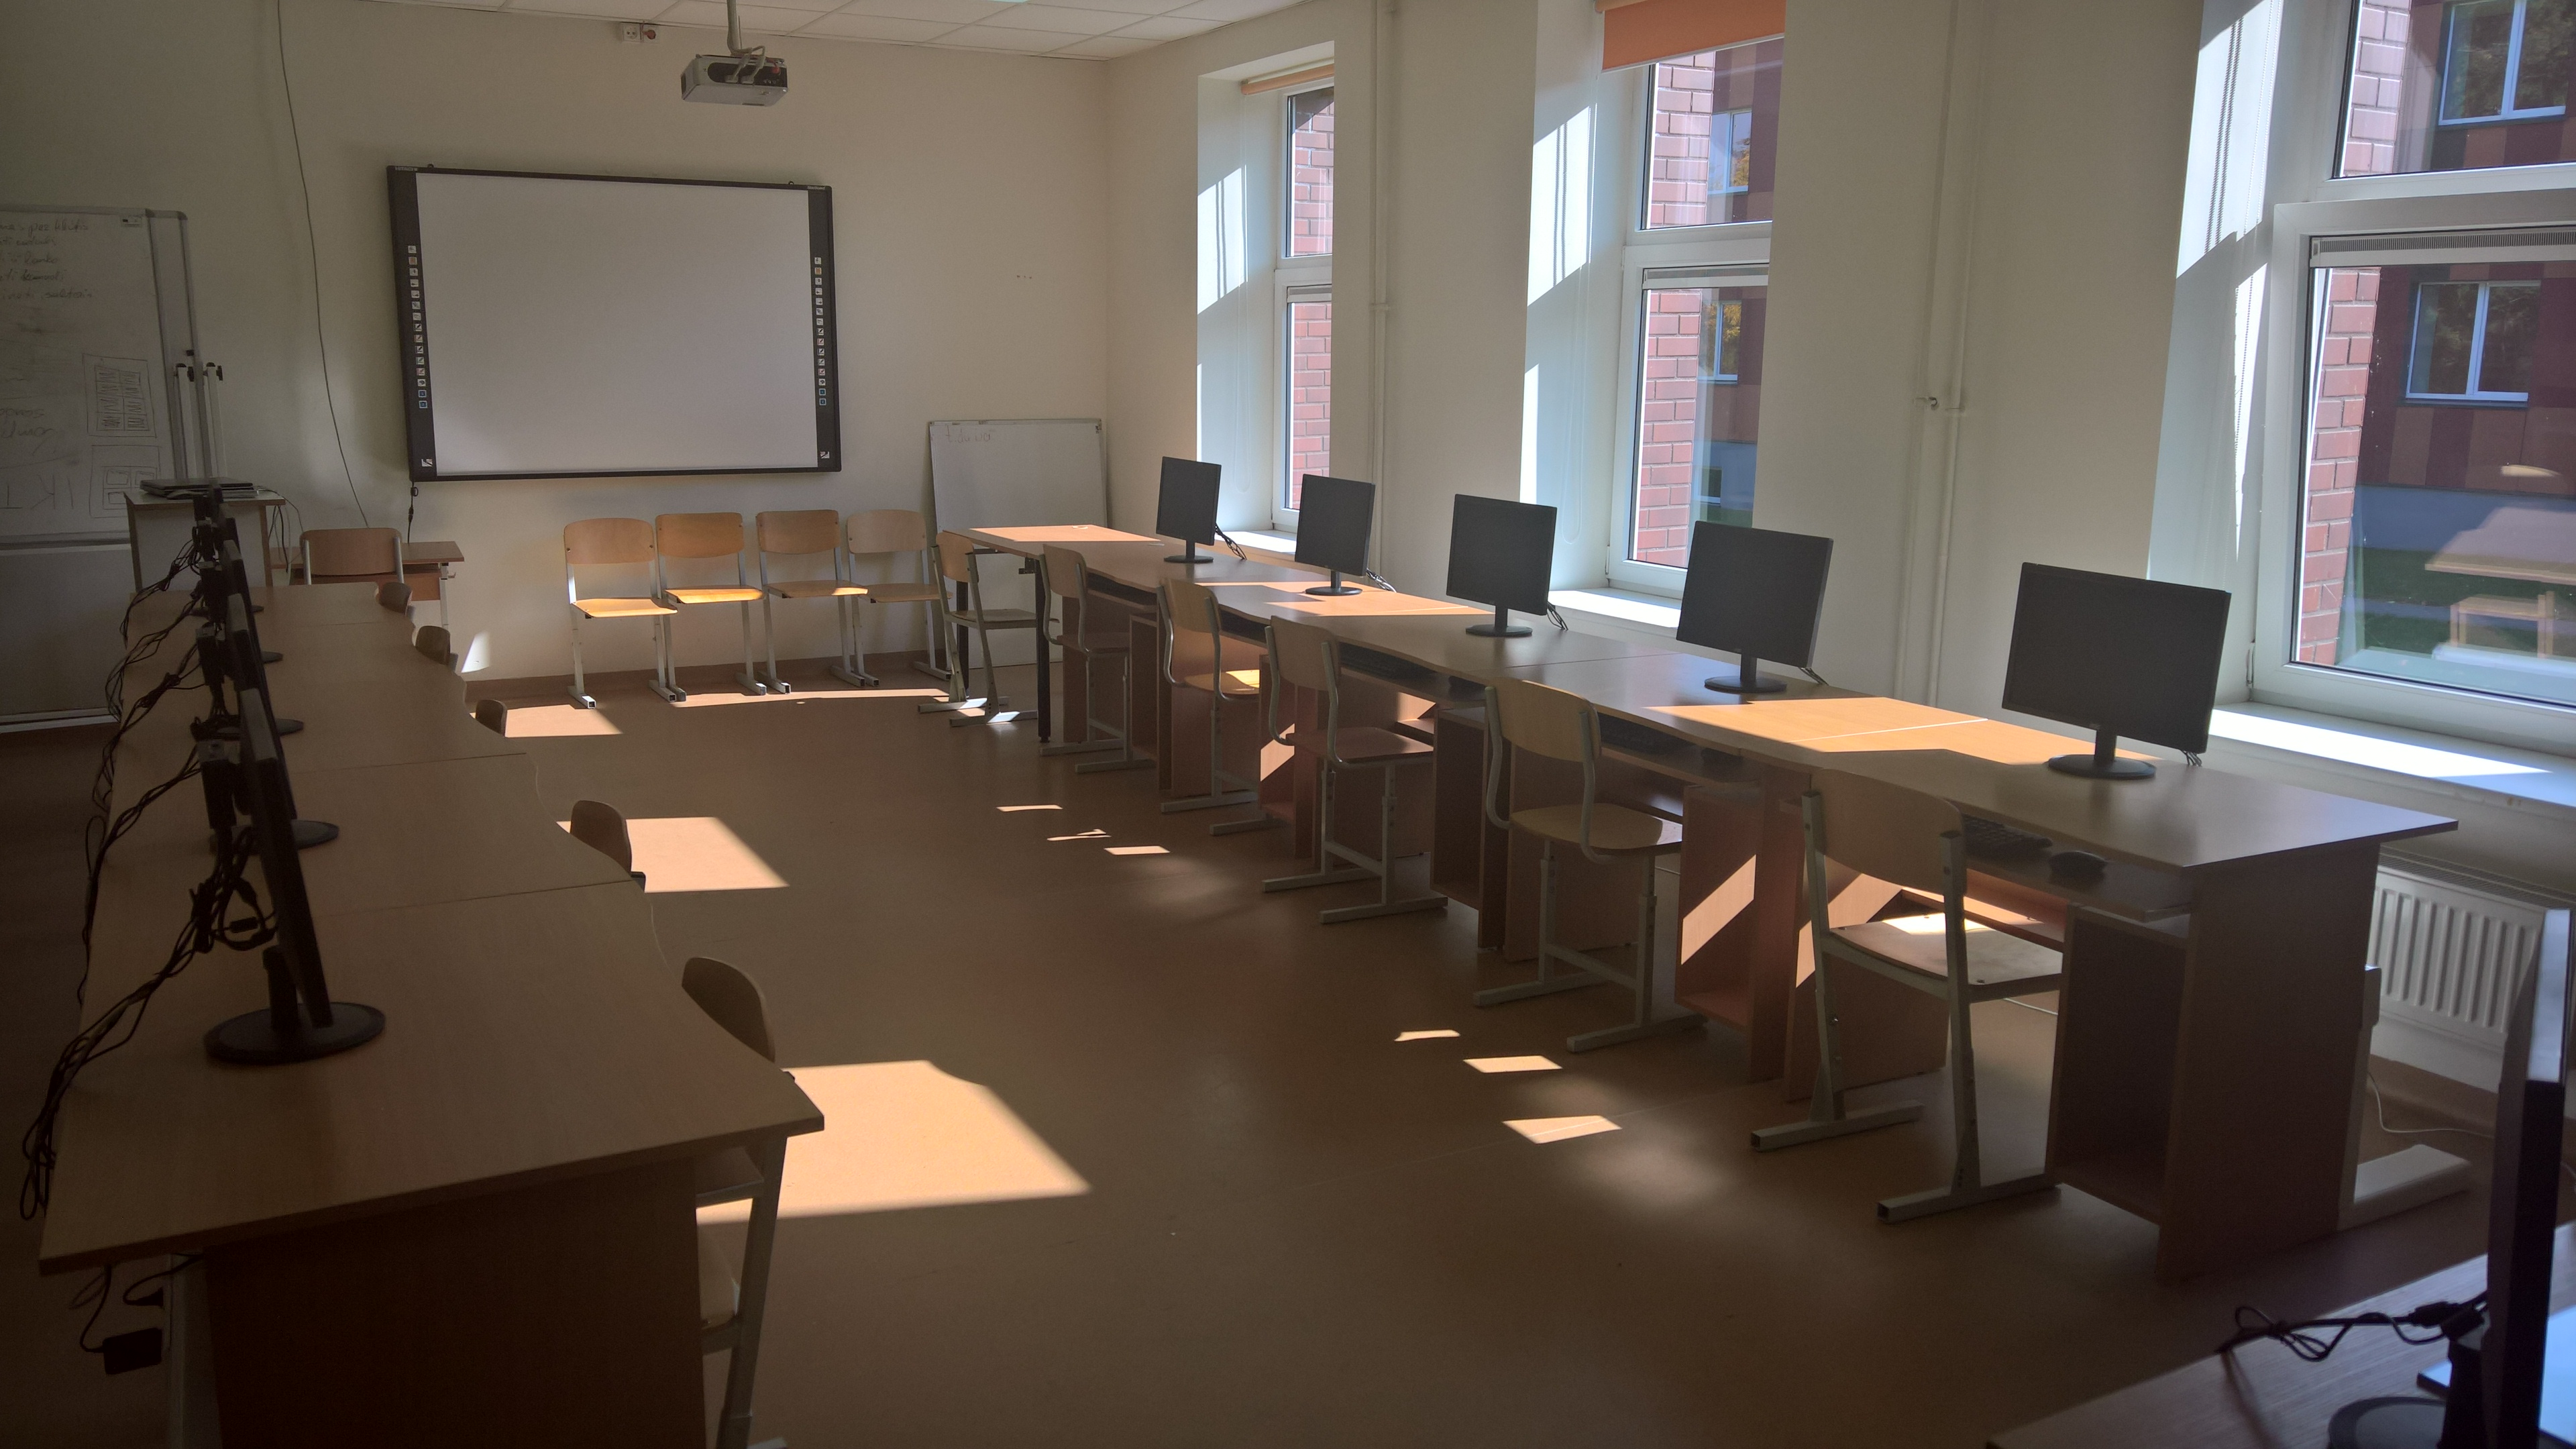 Nevarenu-Primary-School-In-Lithuania-2.jpg